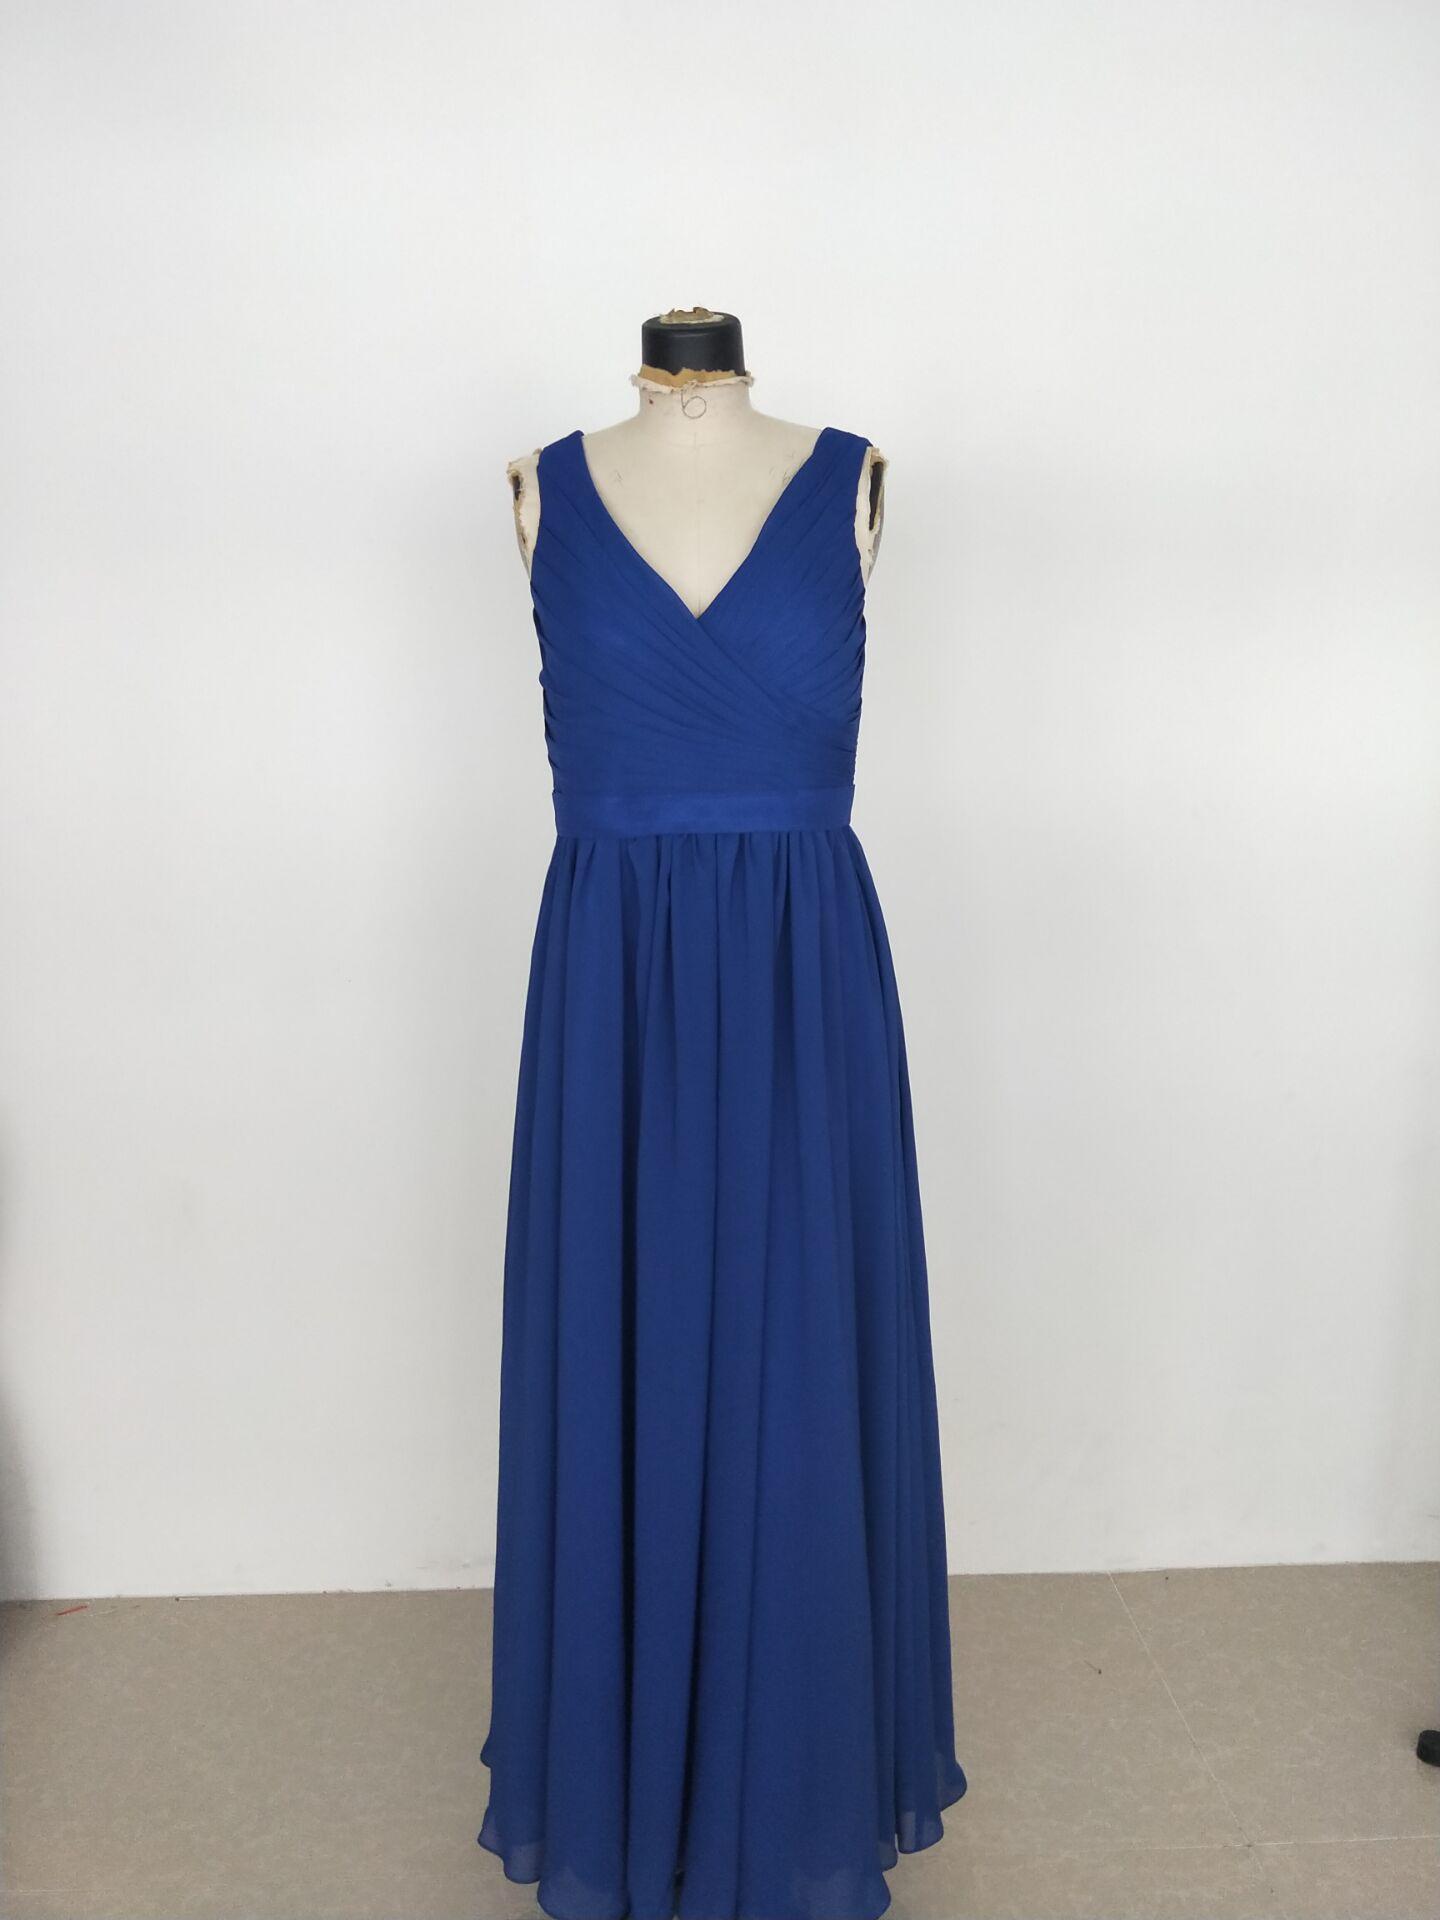 2021 Real pics Chiffon Bridesmaid Dress Sleeveless V-neck and V-back Custom Made Floor Length Maid Of Honor Gown